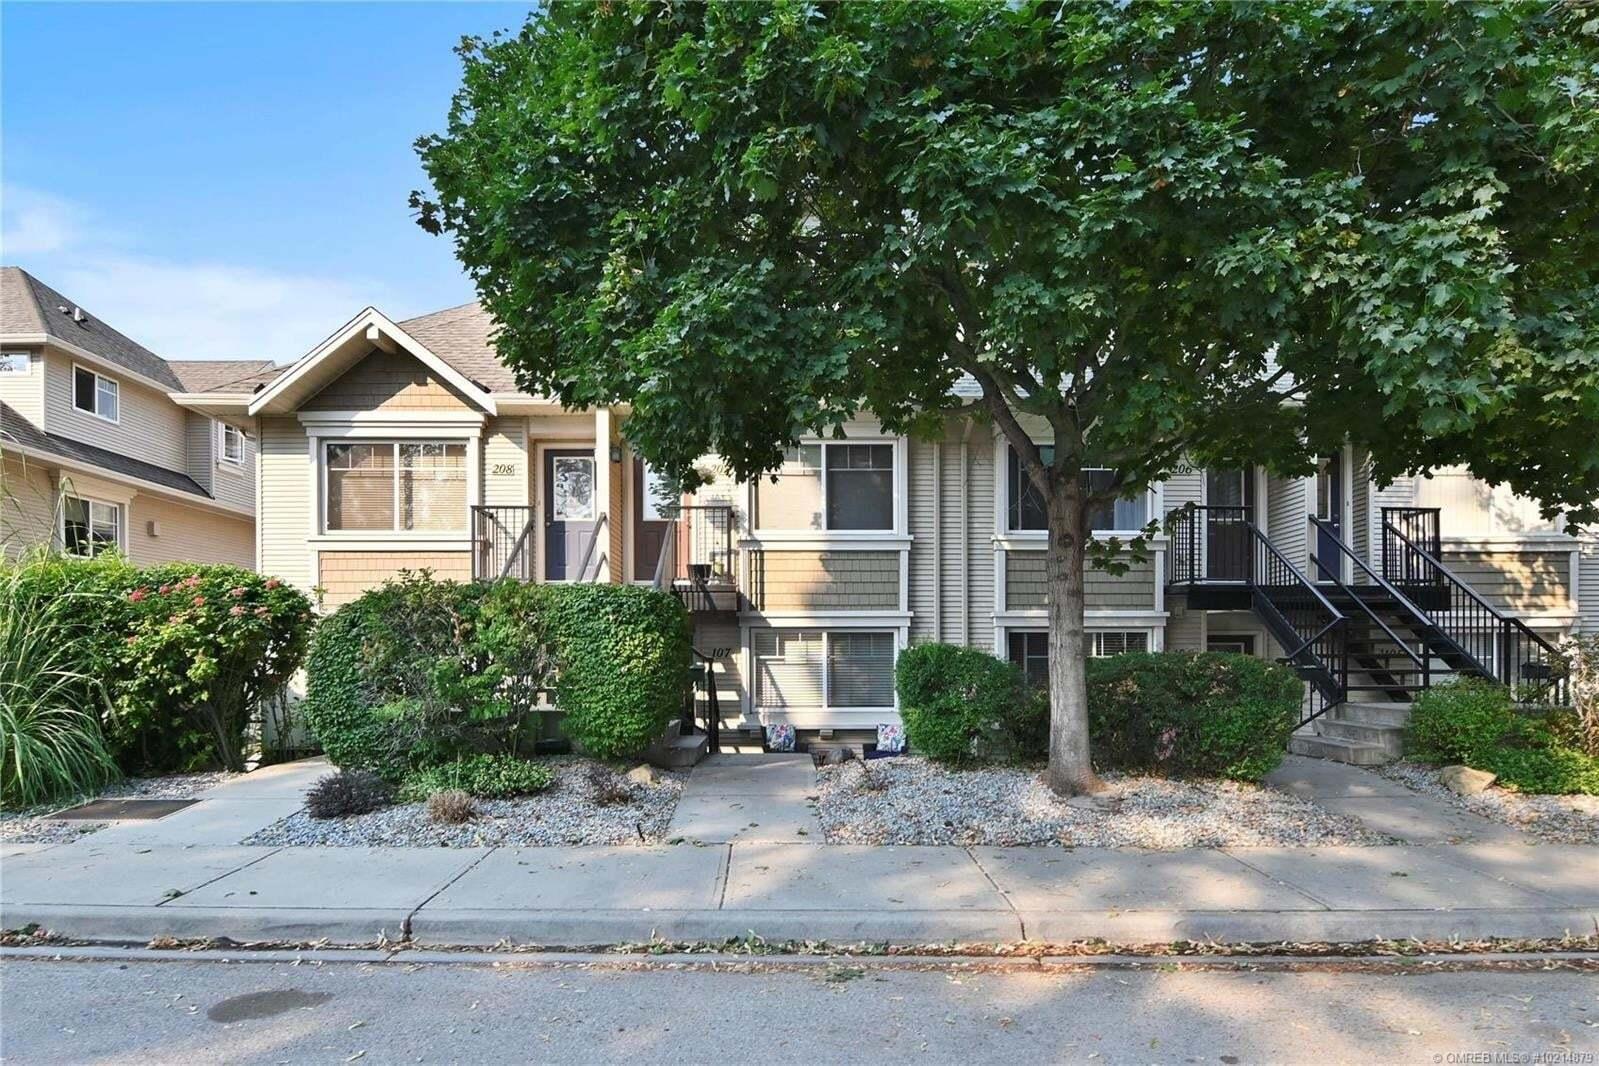 Townhouse for sale at 1380 Dilworth Cres Kelowna British Columbia - MLS: 10214879